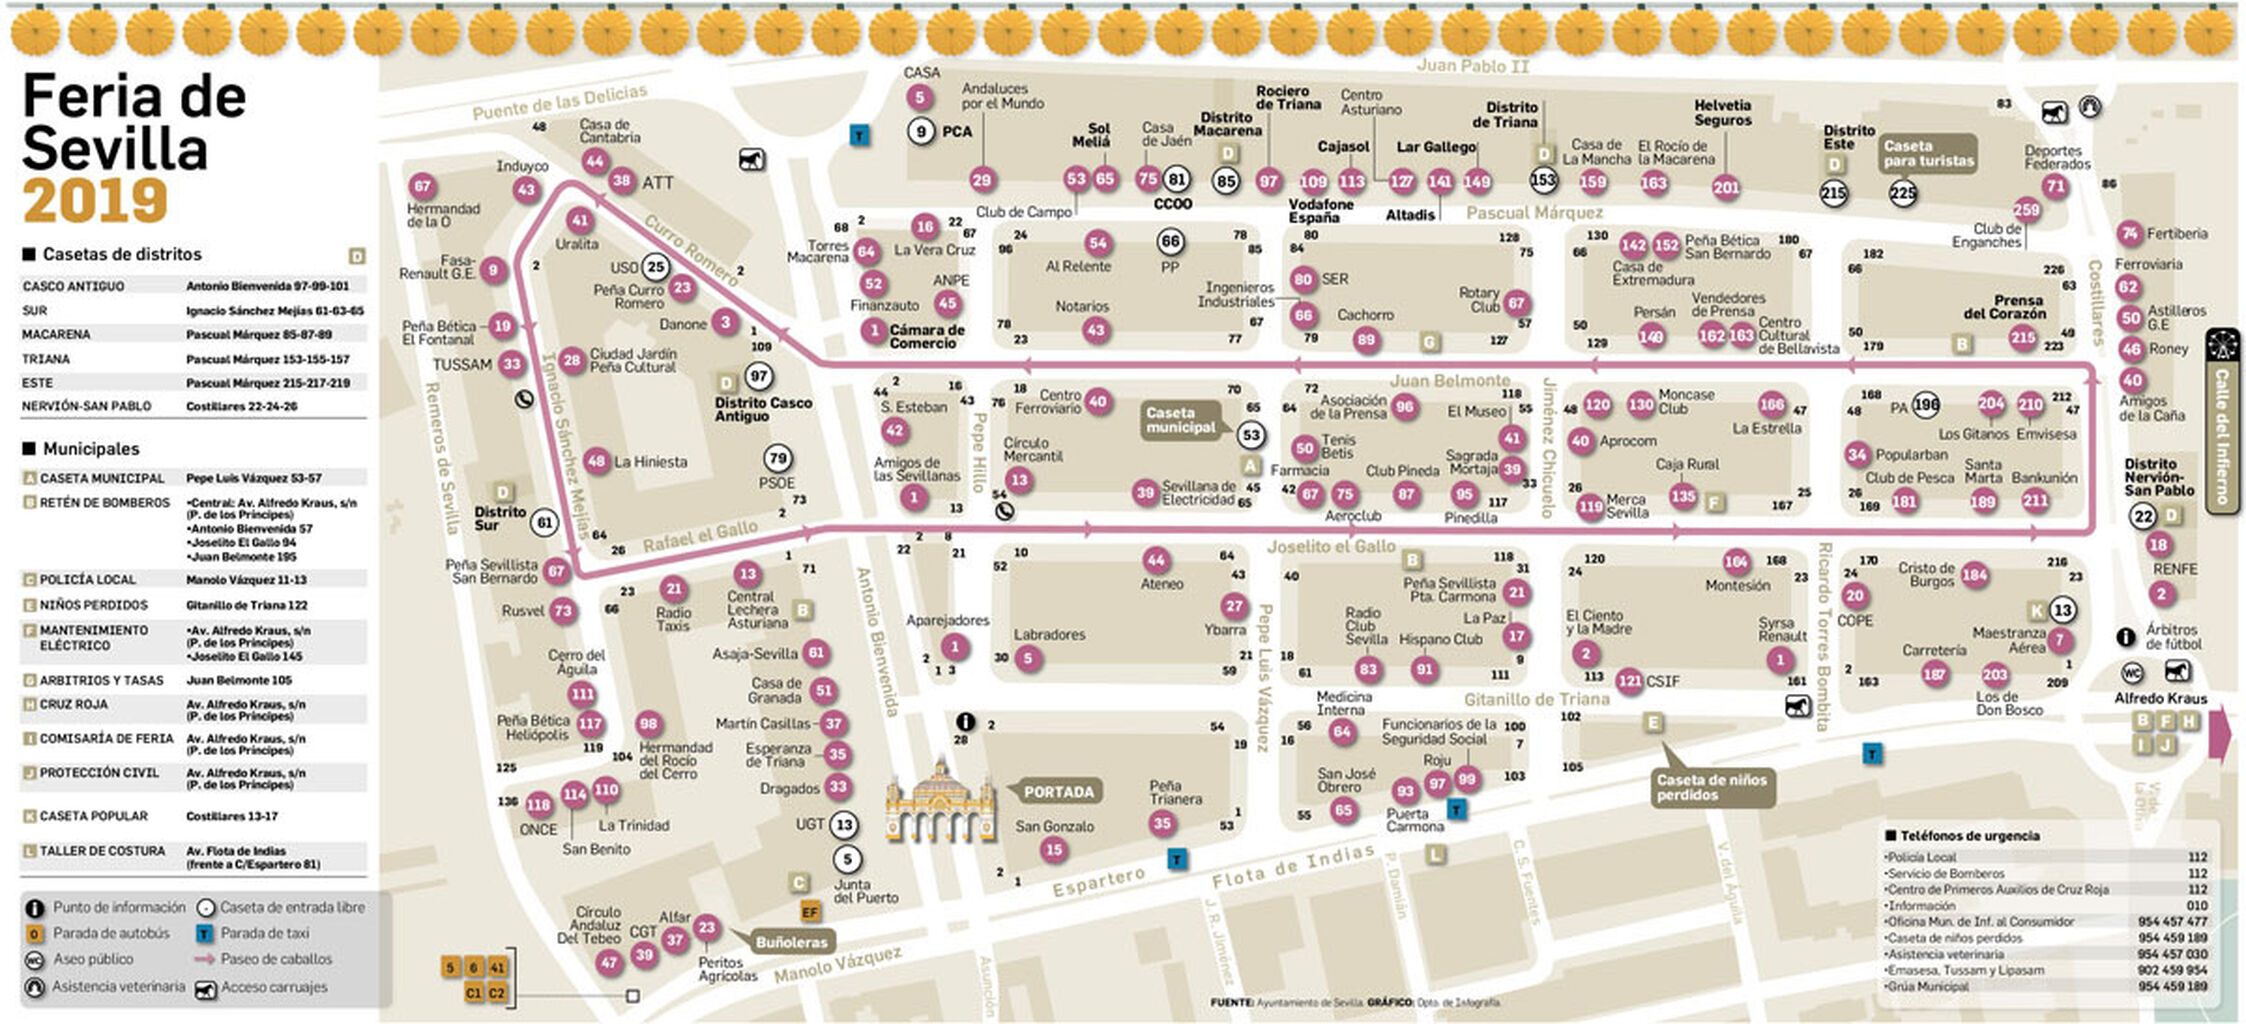 Mapa Feria Sevilla 2019.Todas Las Casetas De La Feria De Abril De Sevilla 2019